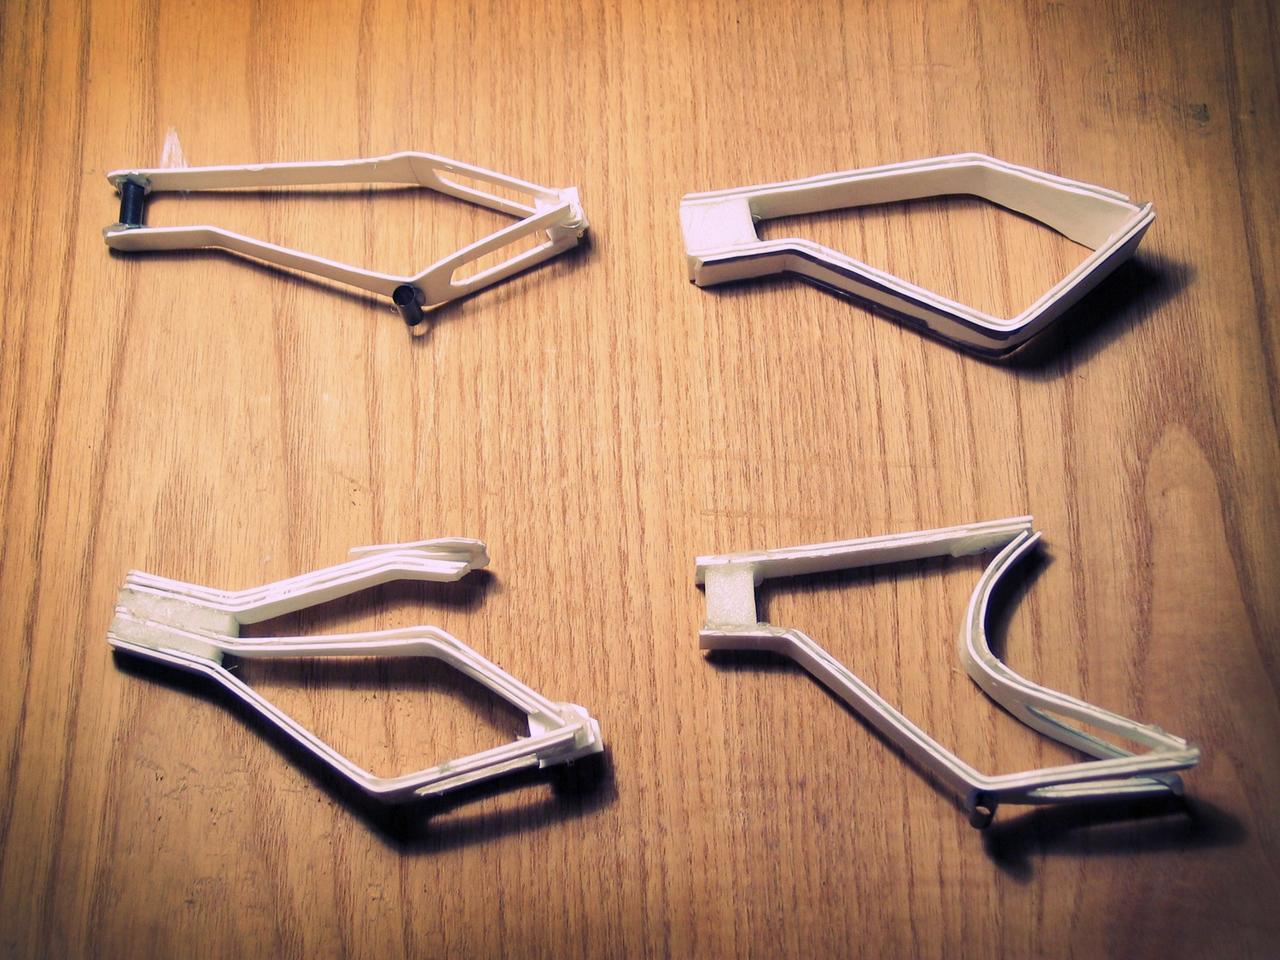 Models of possible frame designs for Bonobo